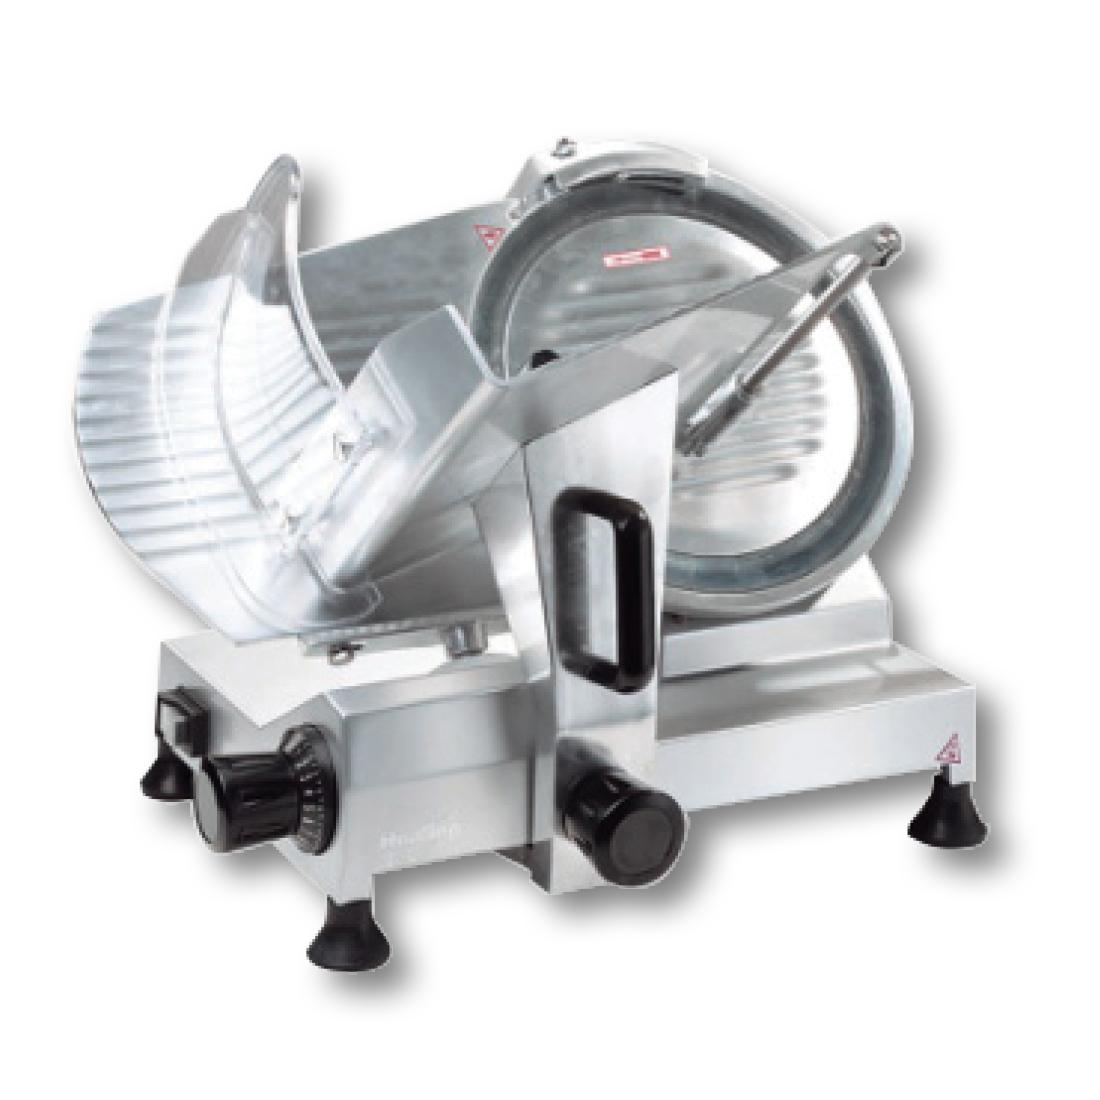 HBS-250 JACKS Professional Deli Slicer